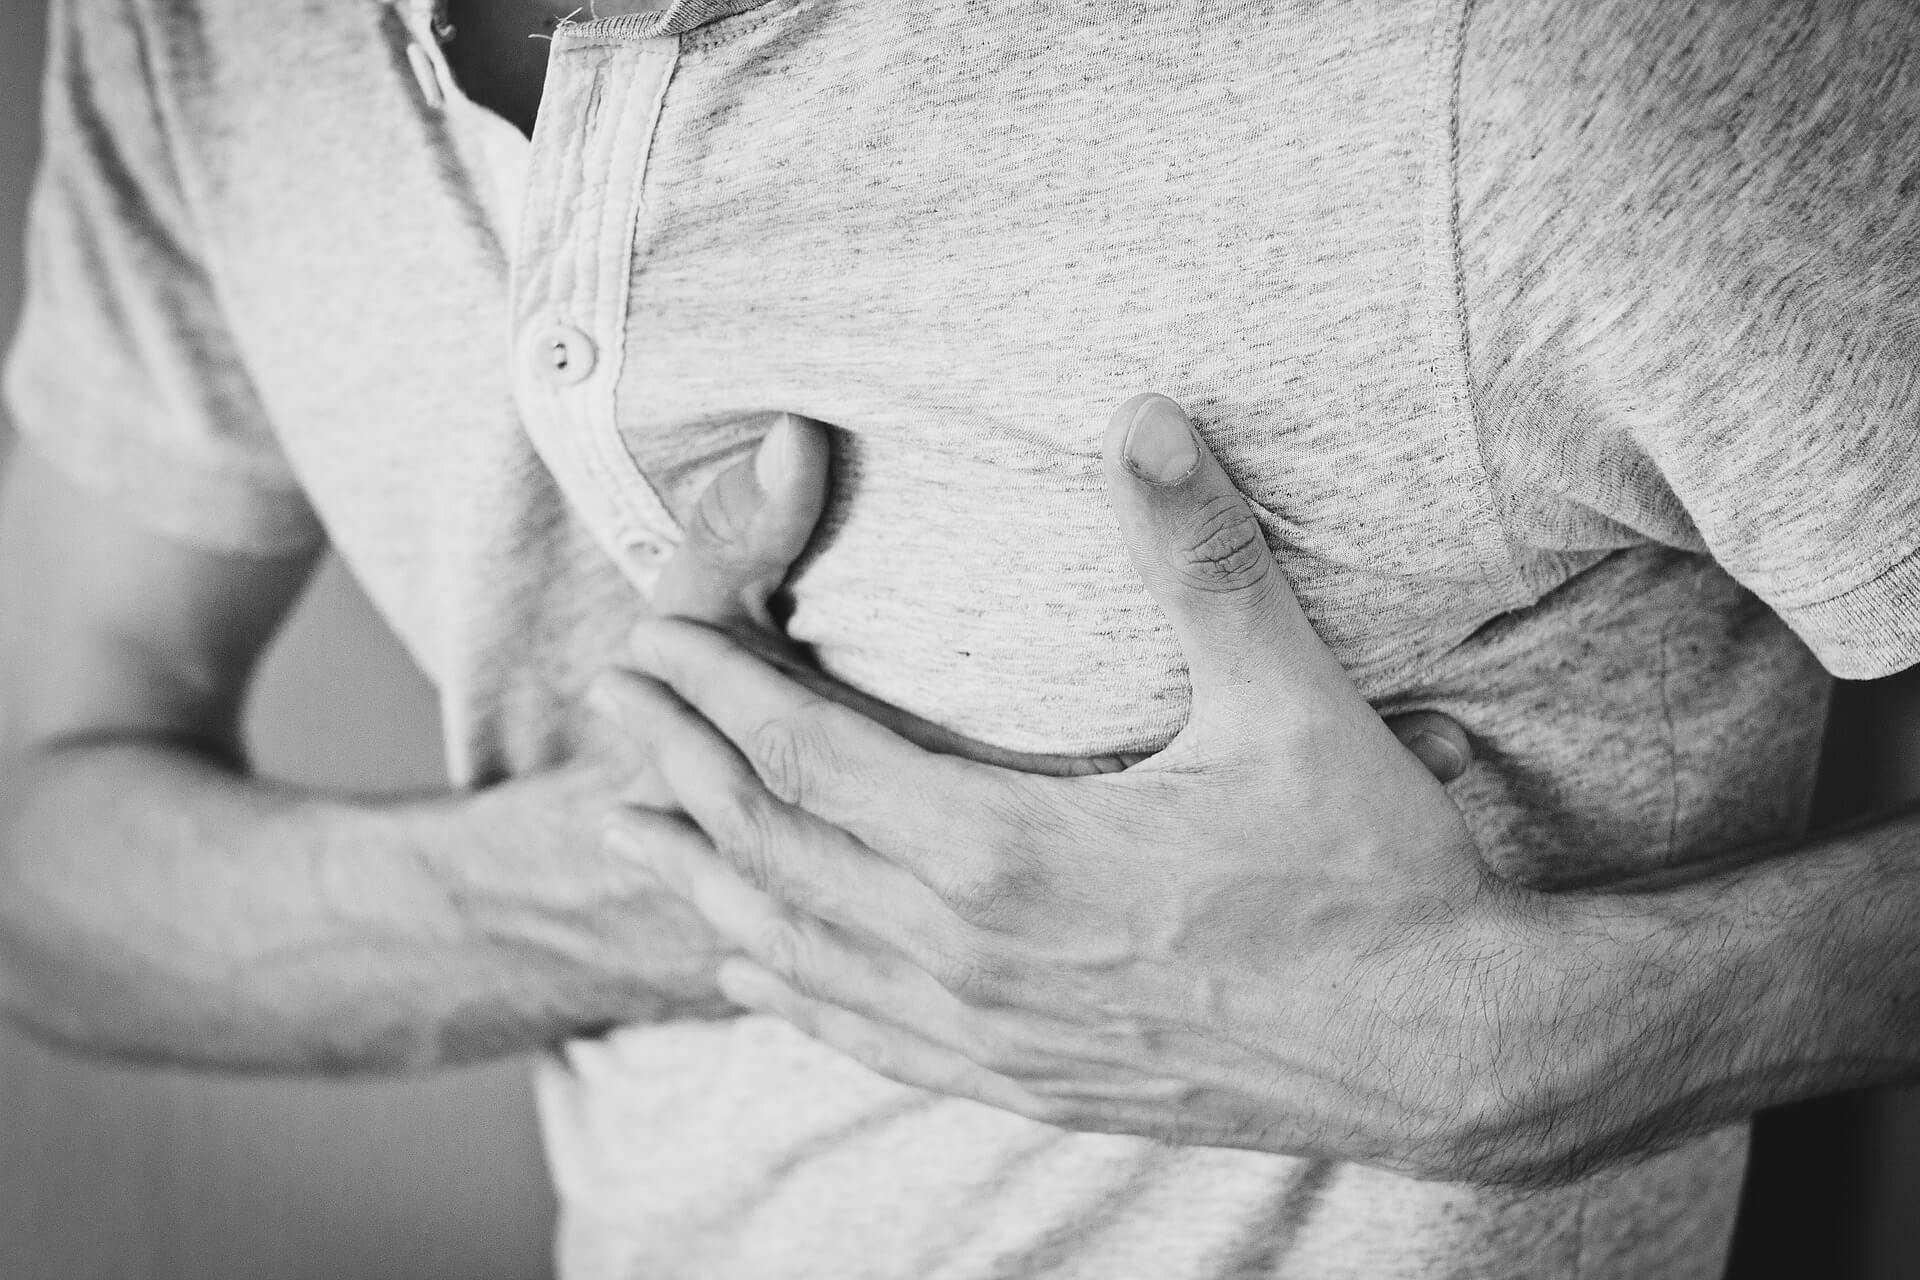 Cómo prevenir un infarto de miocardio o accidente cardiovascular